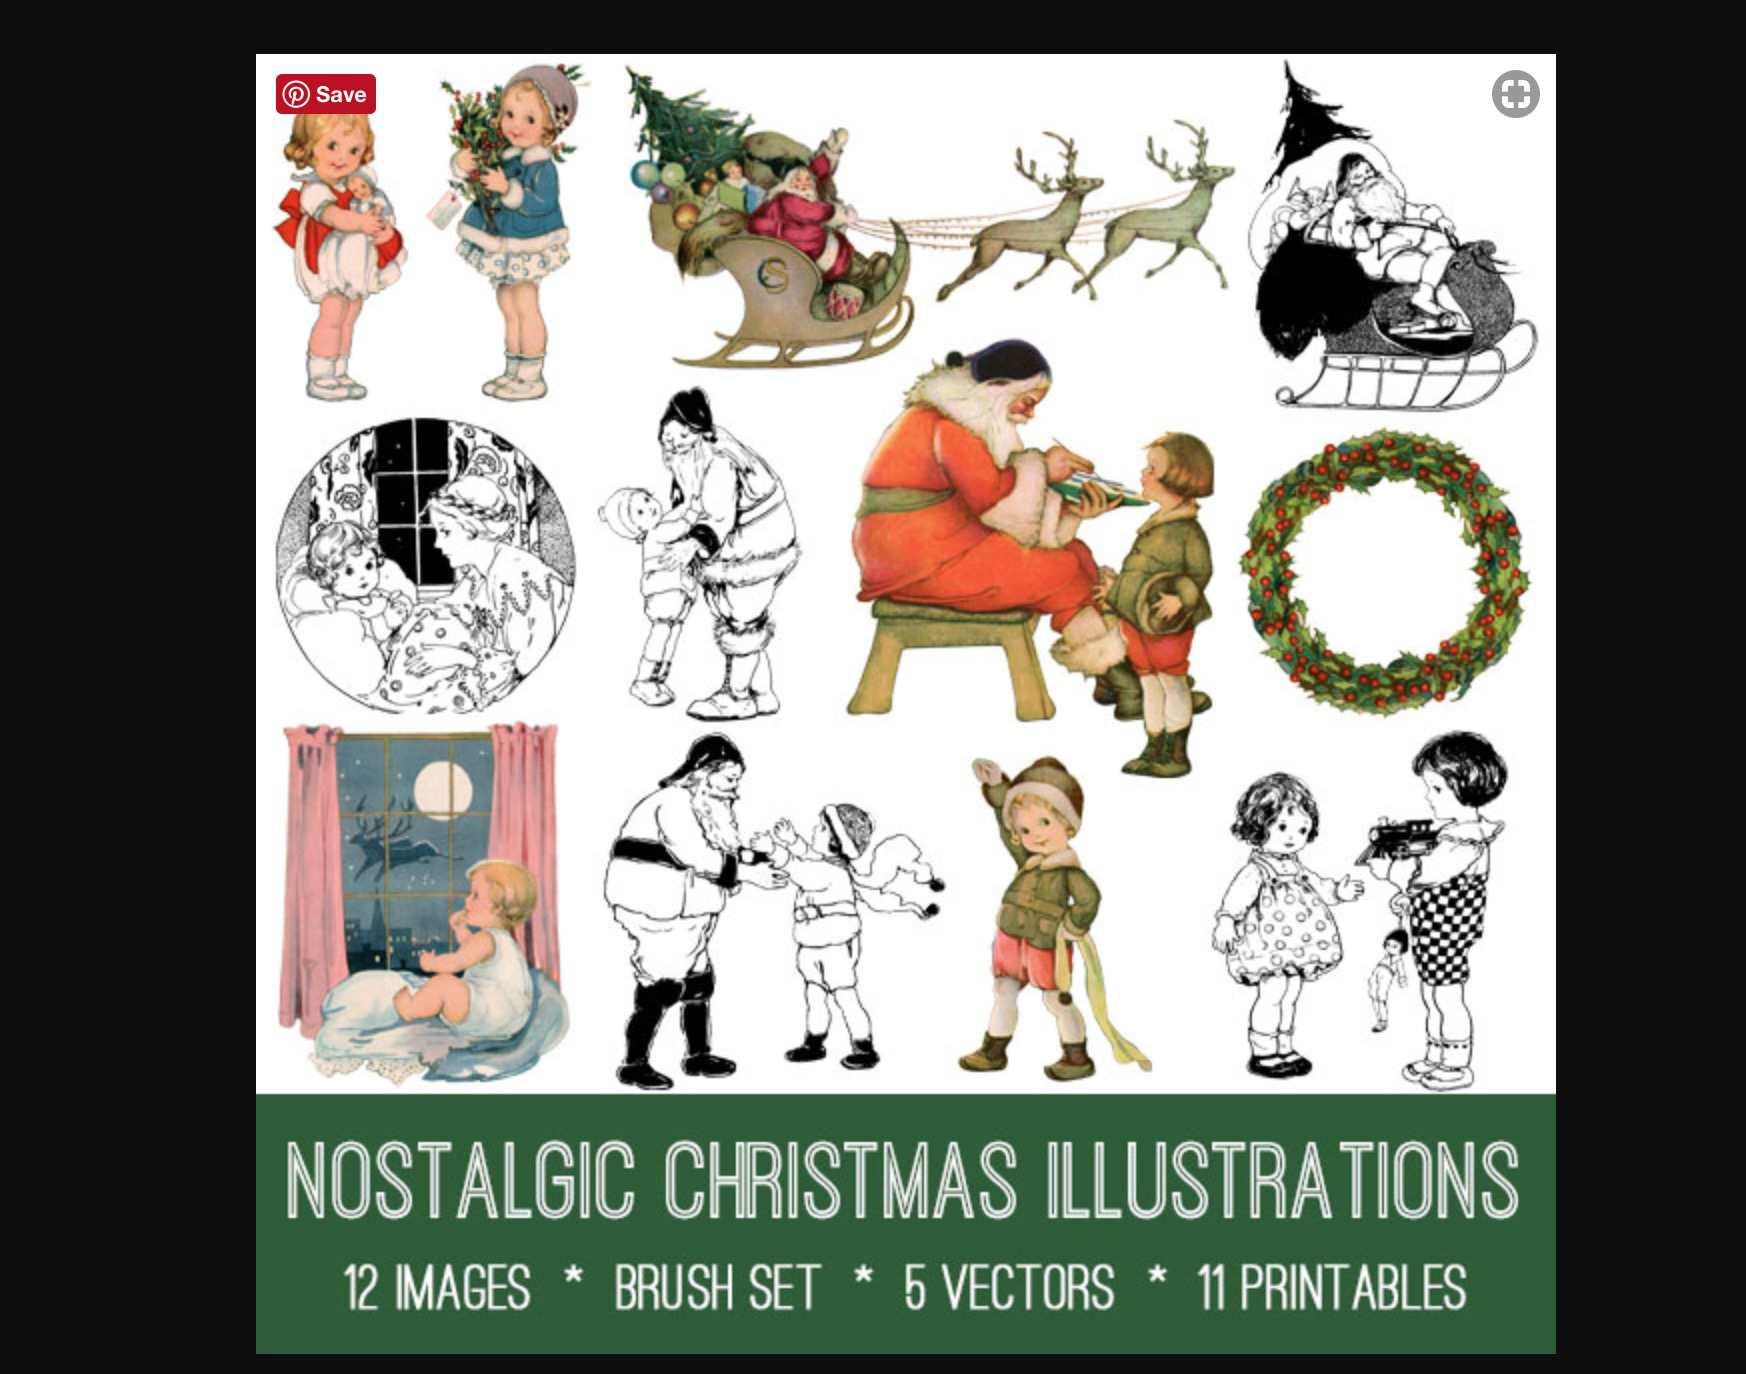 Nostalgic Christmas illustrations